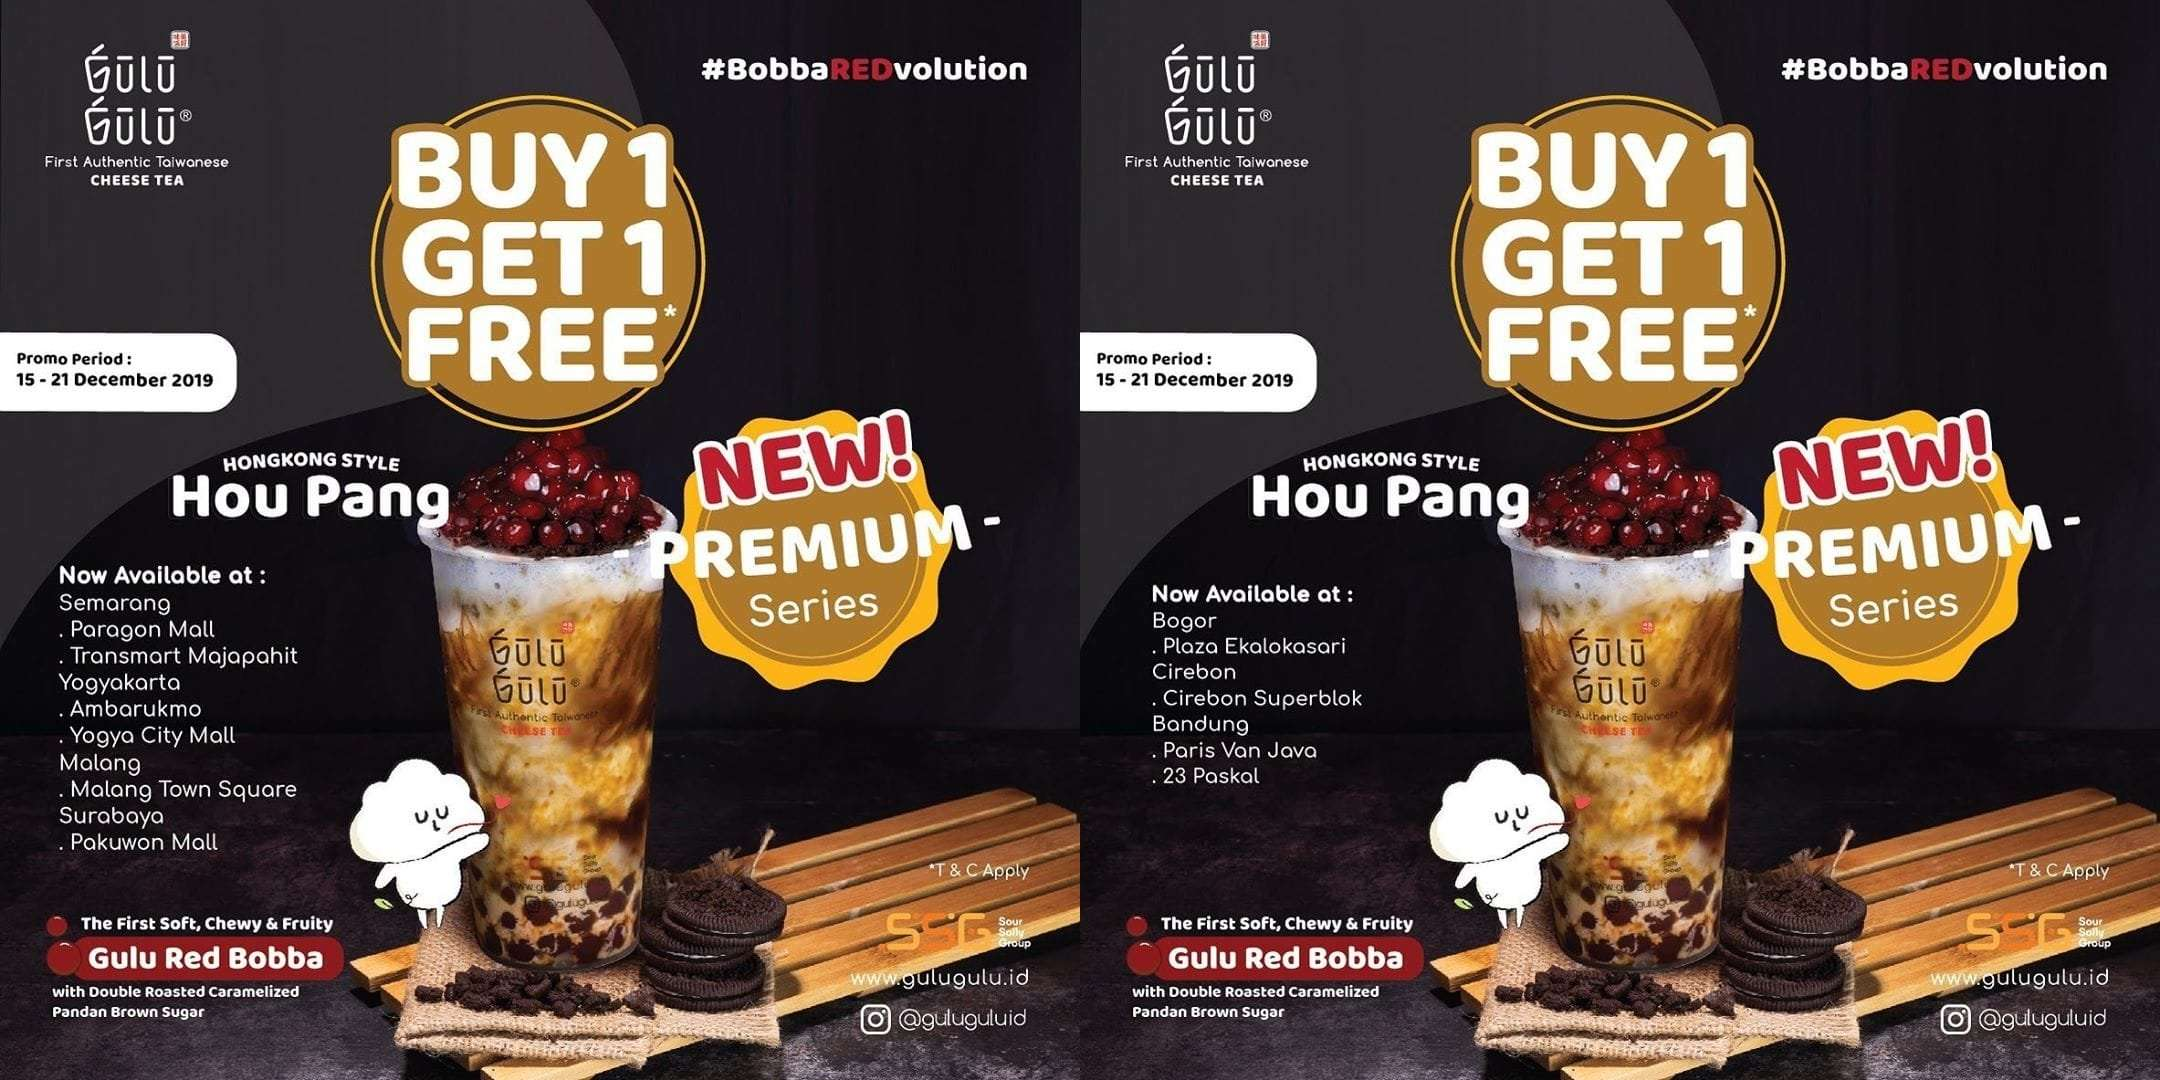 Gulu Gulu Promo Spesial Premium Series Boba Redvolution, Buy 1 Get 1 Free Is Back!